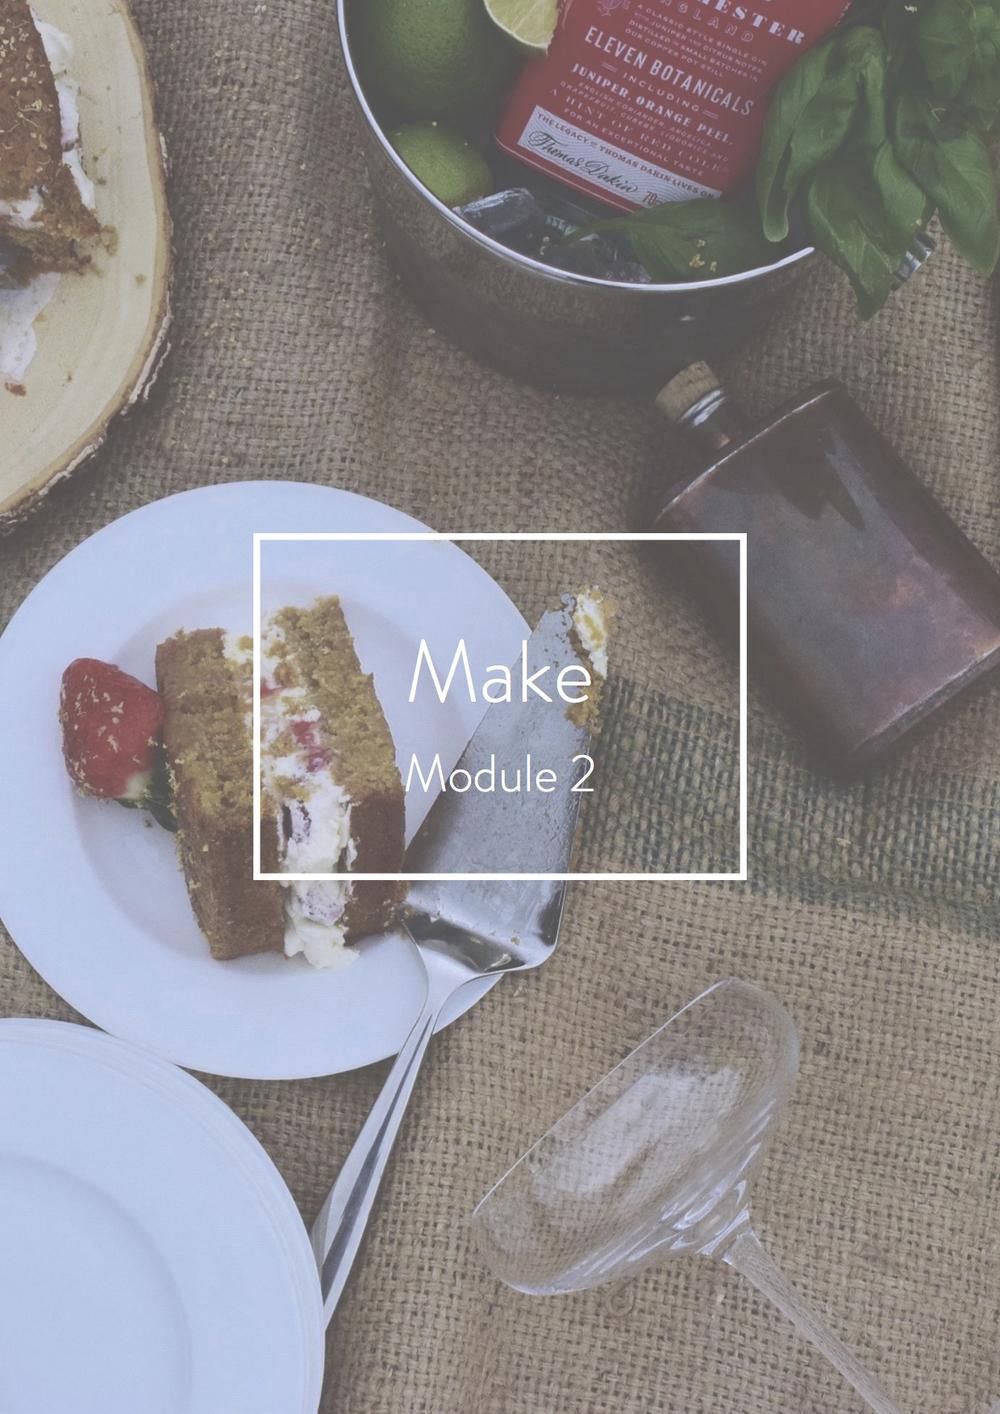 Make module title page.jpg